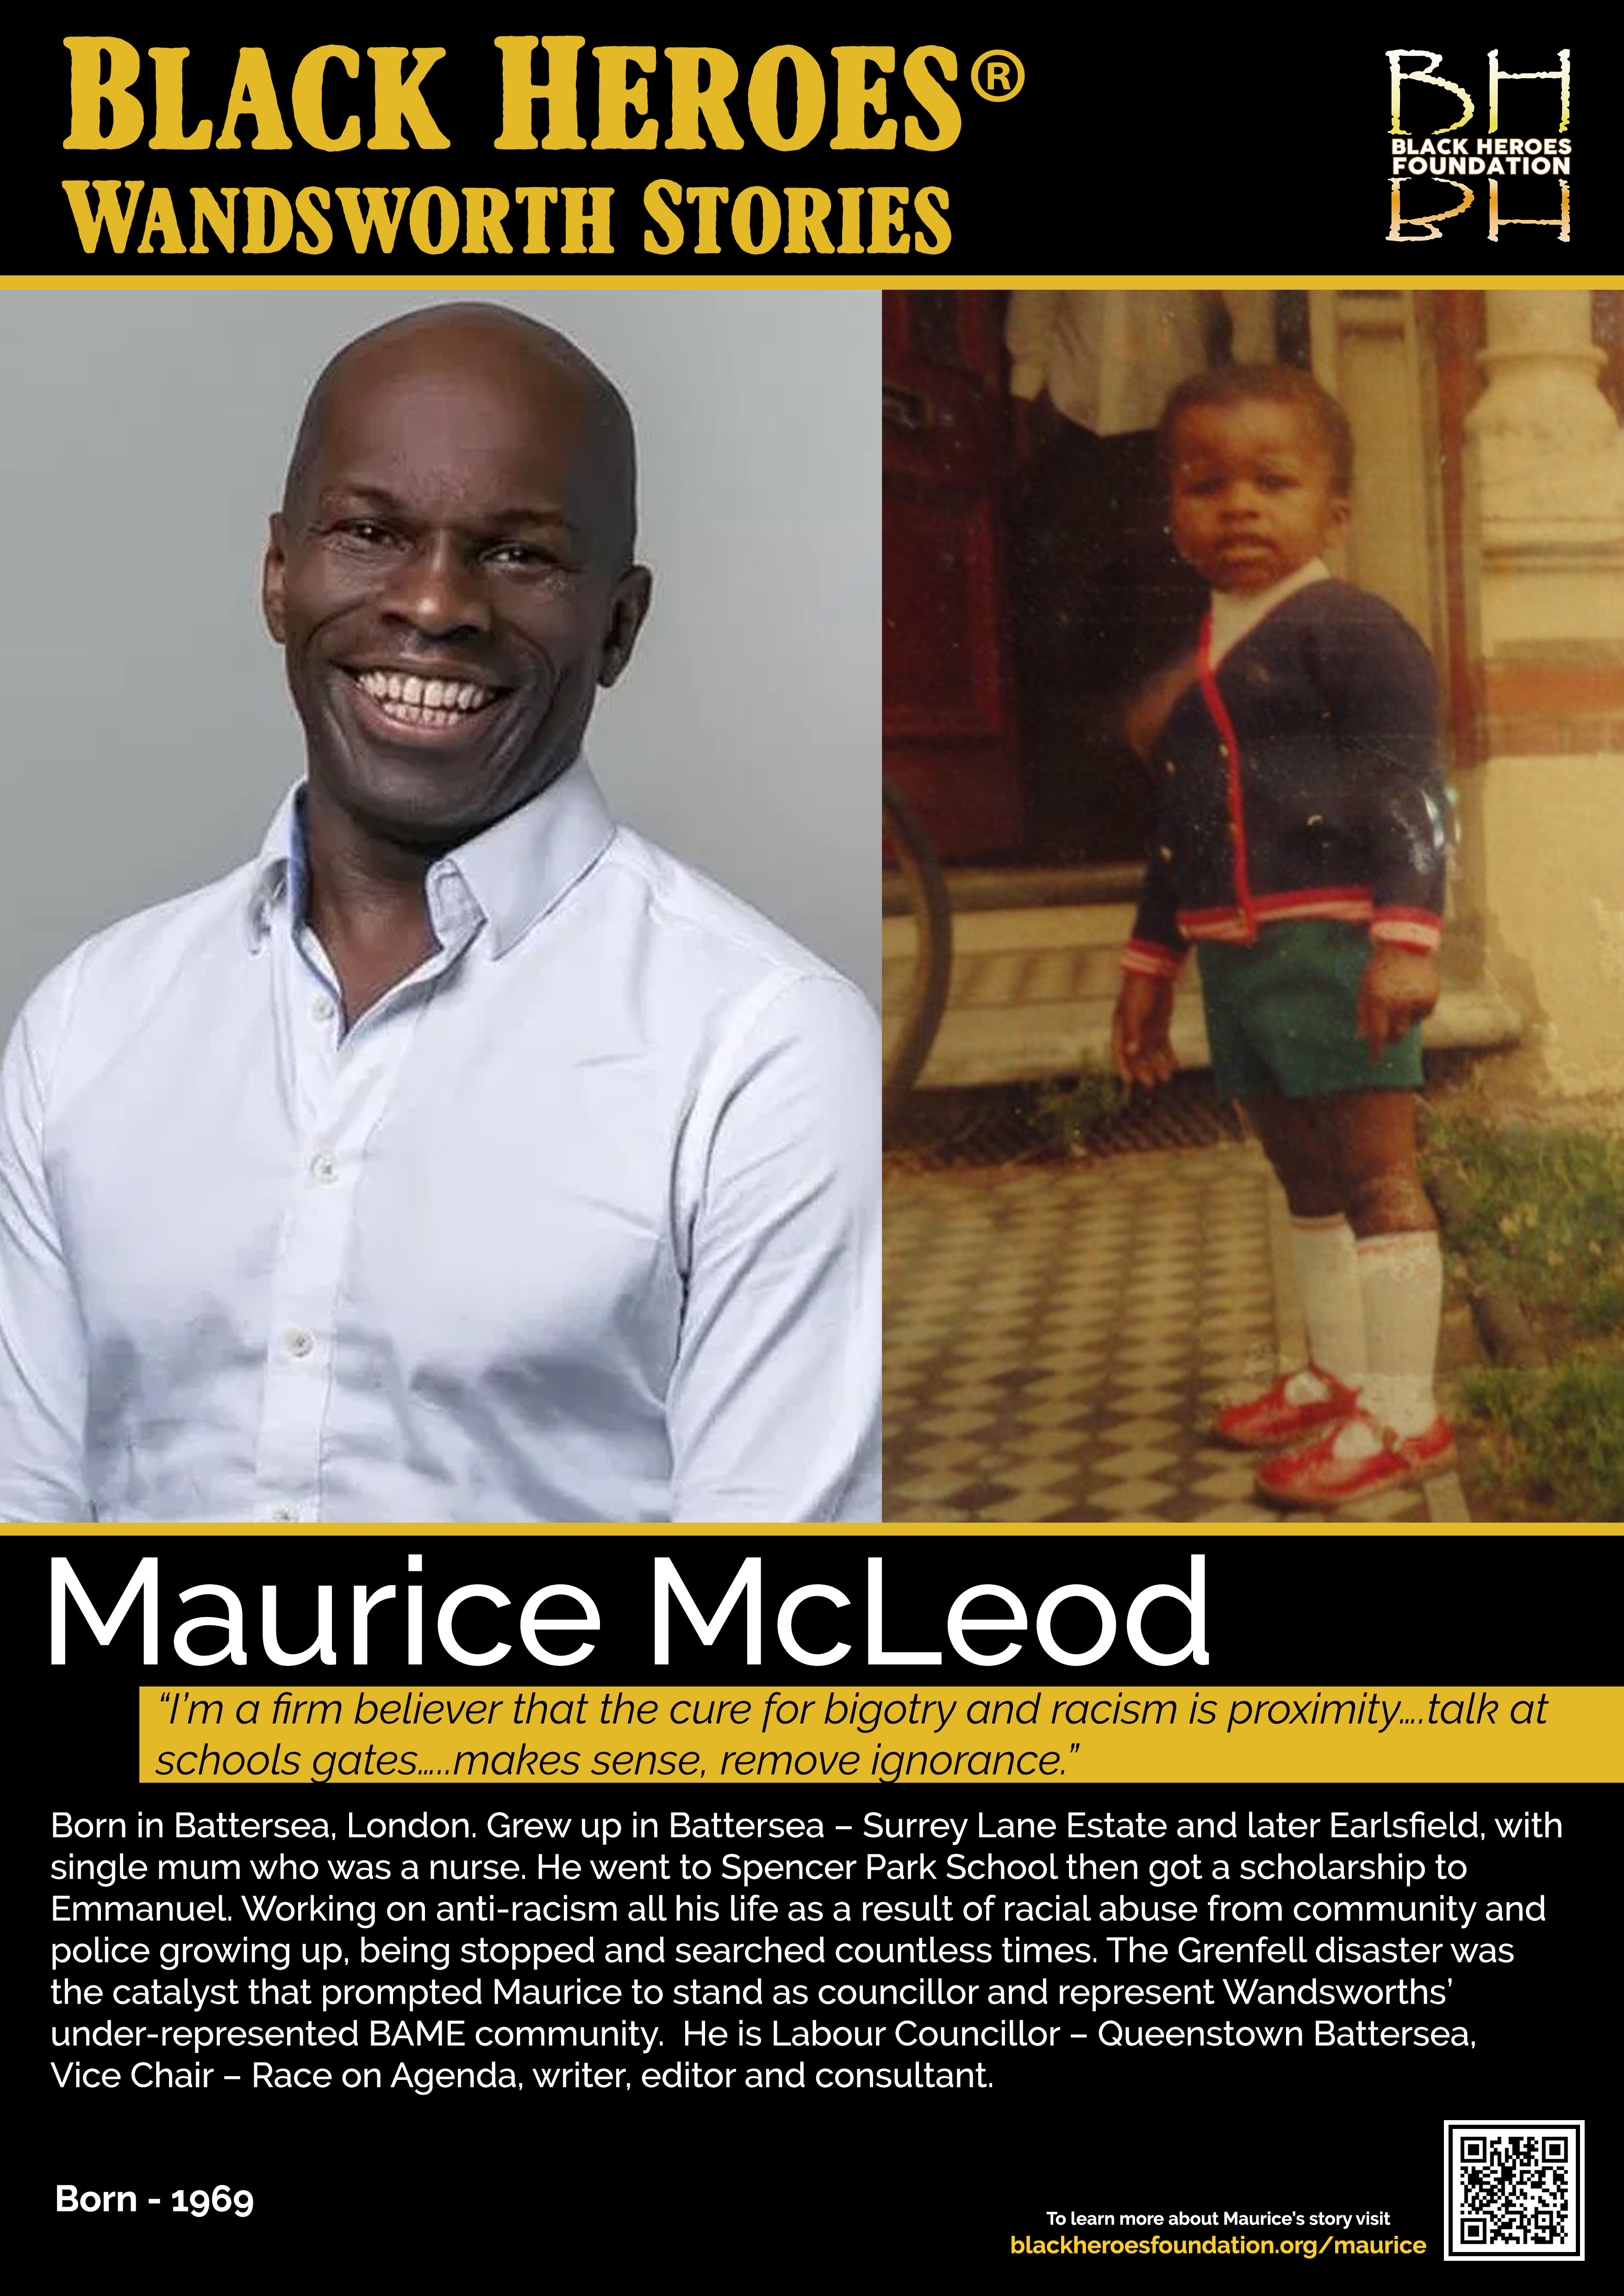 Maurice McCleod Labour Councillor